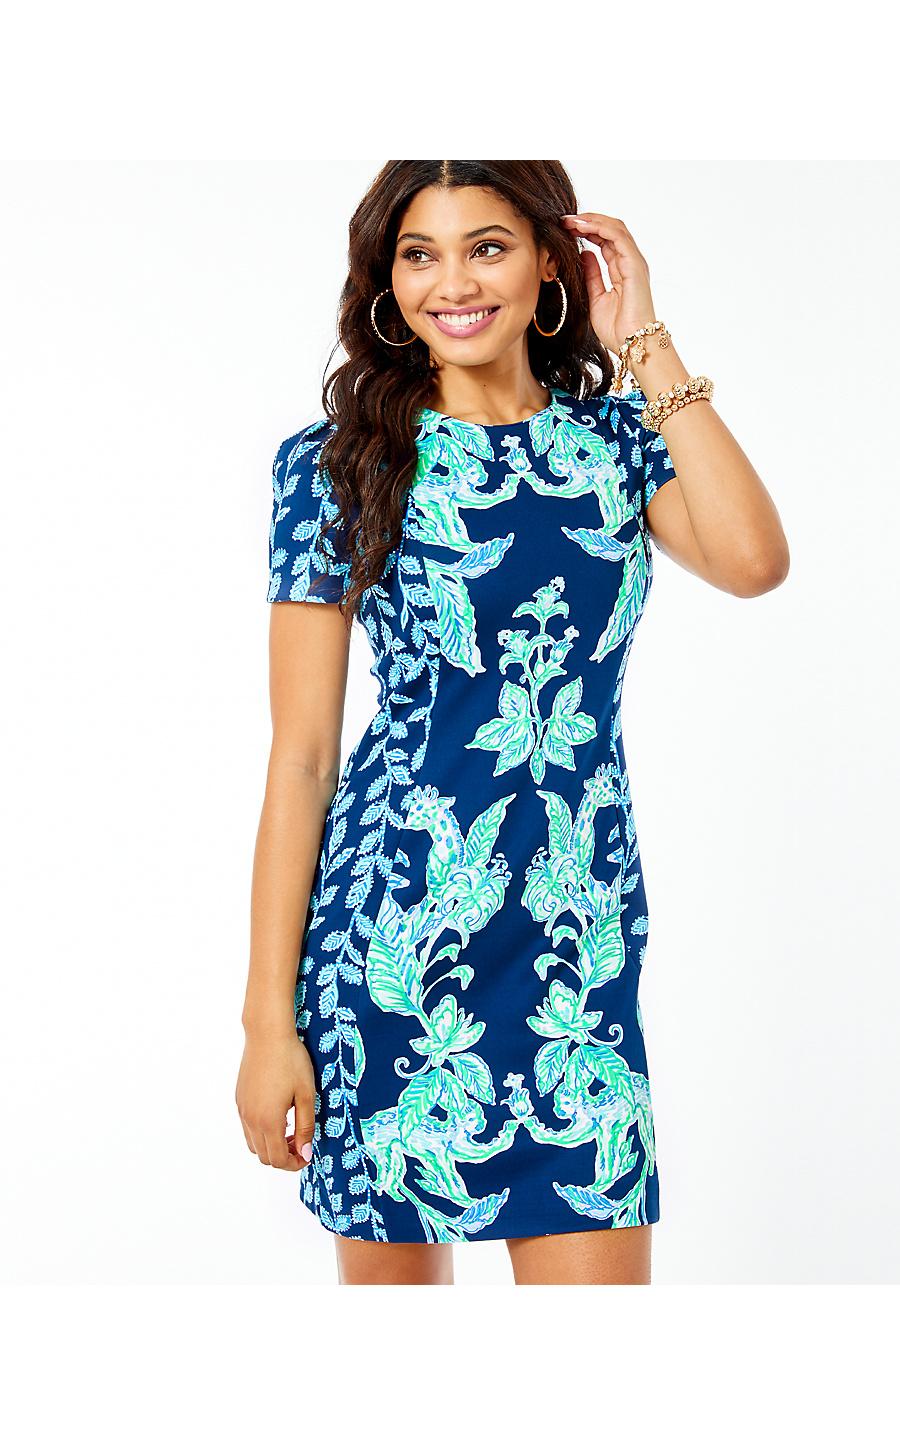 004253 LELICIA DRESS